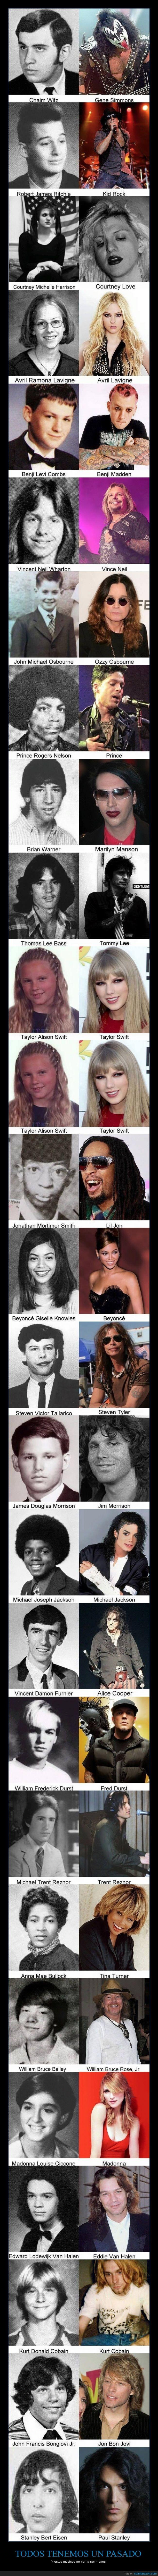 Alice Cooper,Beyonce,cantante,Fred Durst,guitarrista,Jon Bon Jovi,Kurt Cobain,Madonna,Michael Jackson,músico,Taylor Swift,Tina Turner,Trent Reznor,Van Halen